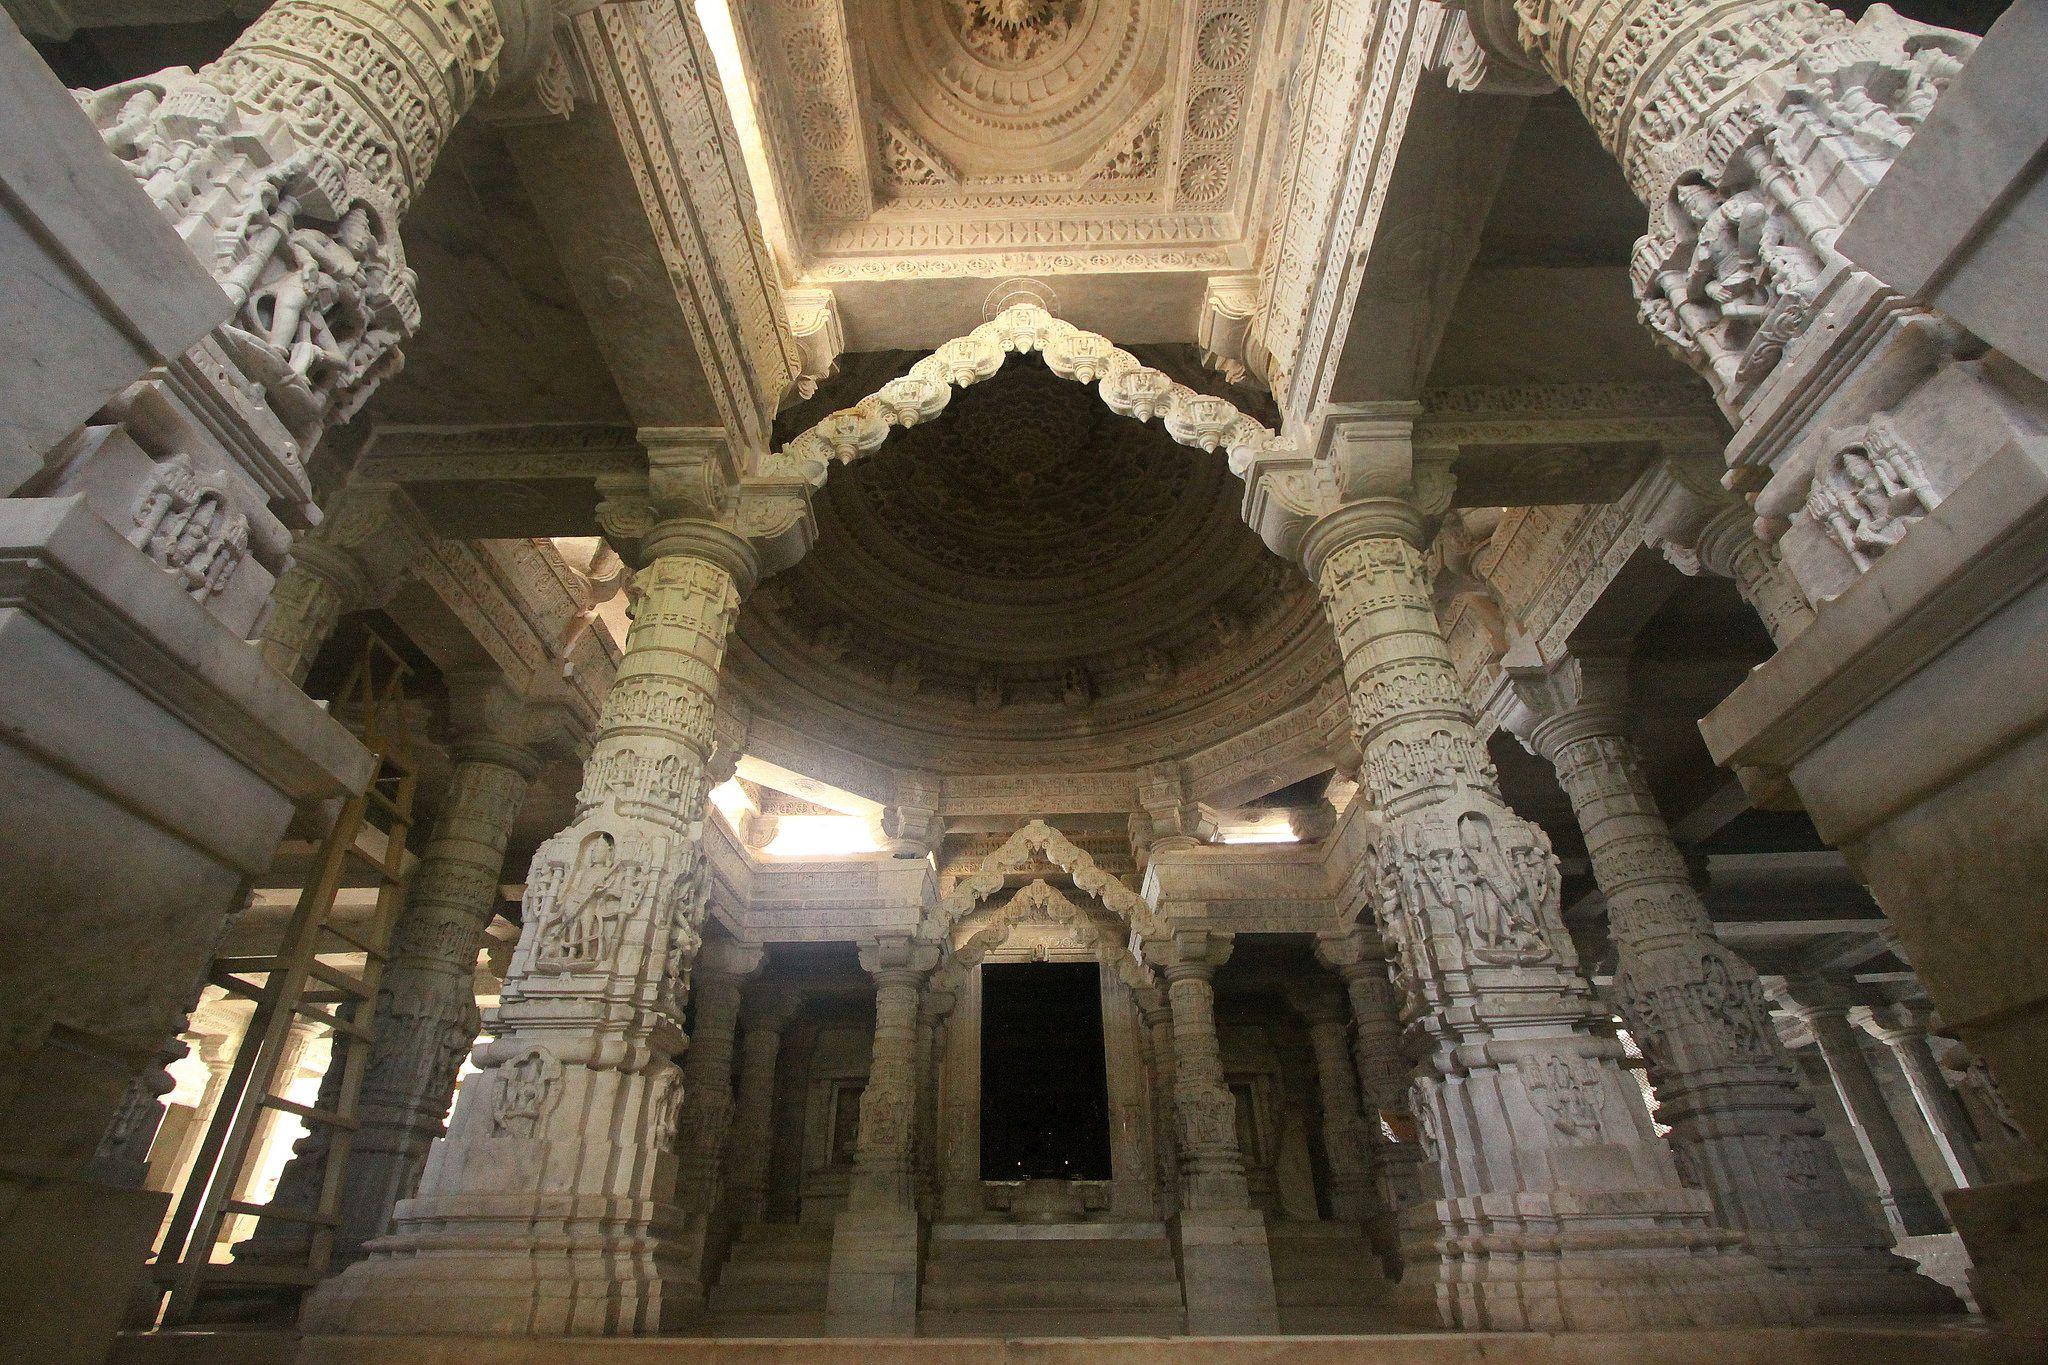 https://flic.kr/p/DRf39U | india - a view of gujarat | India - A view of Gujarat.